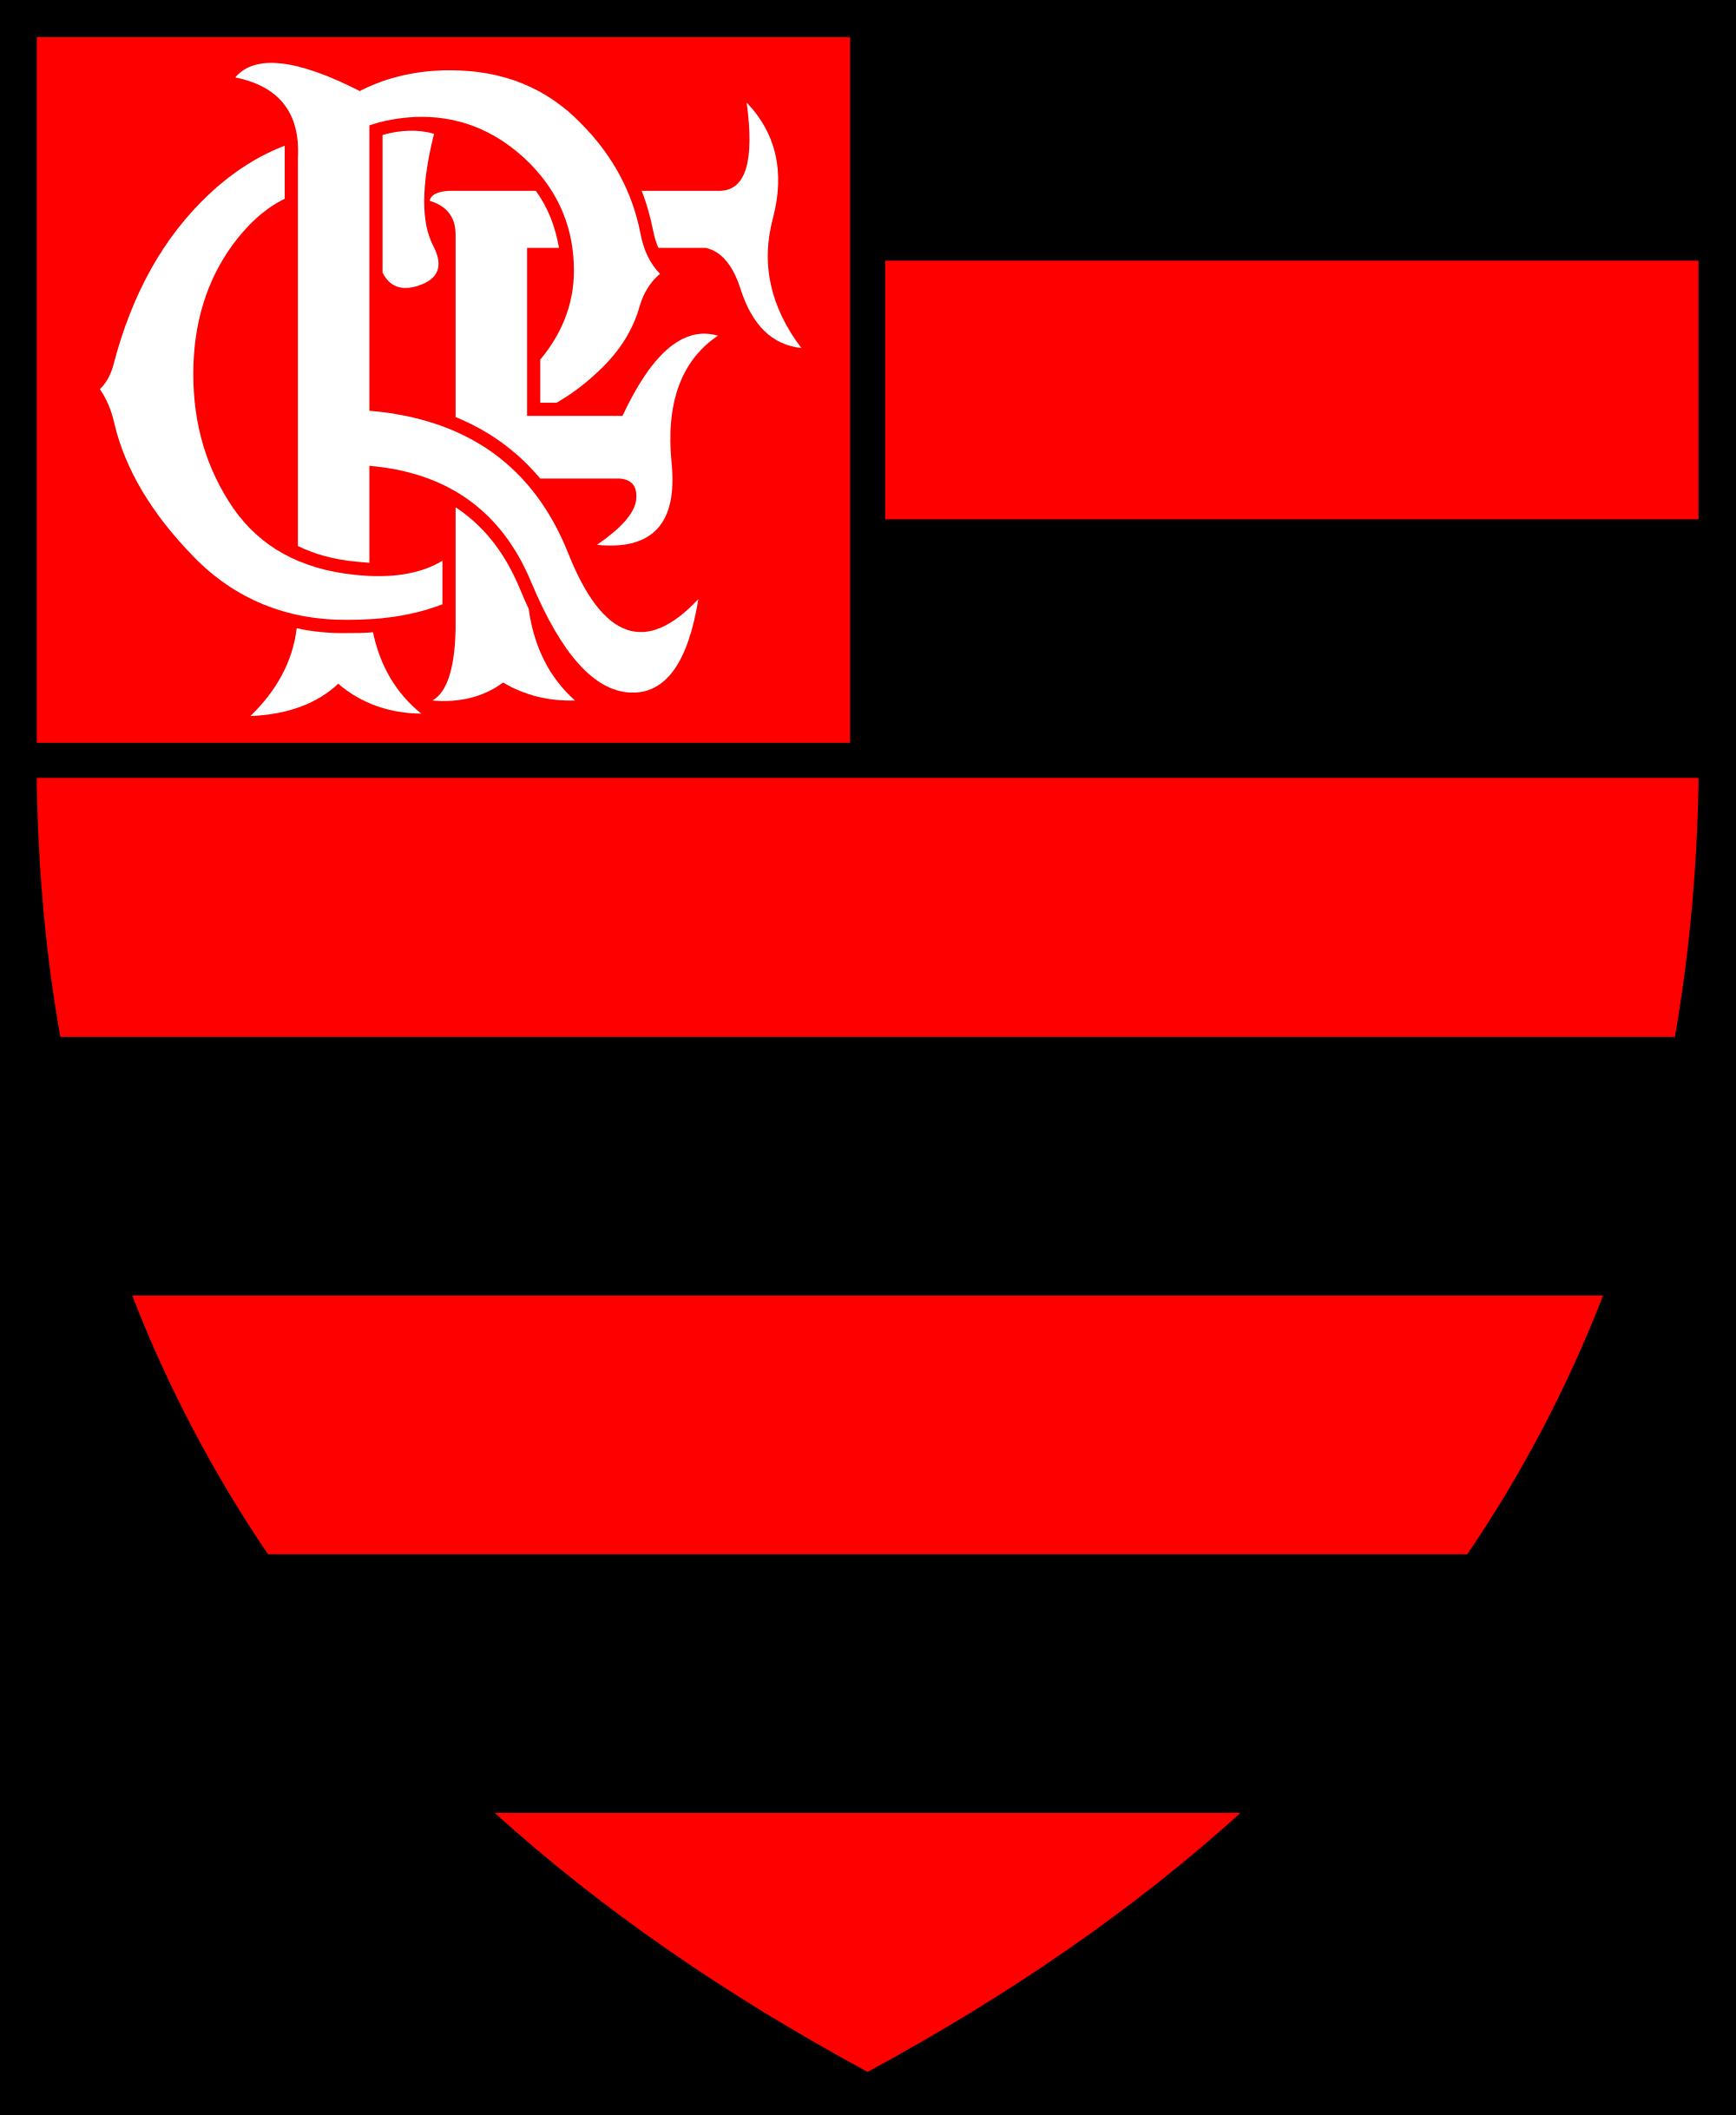 Escudo do Clube de Regatas Flamengo, time brasileiro do Rio de ...